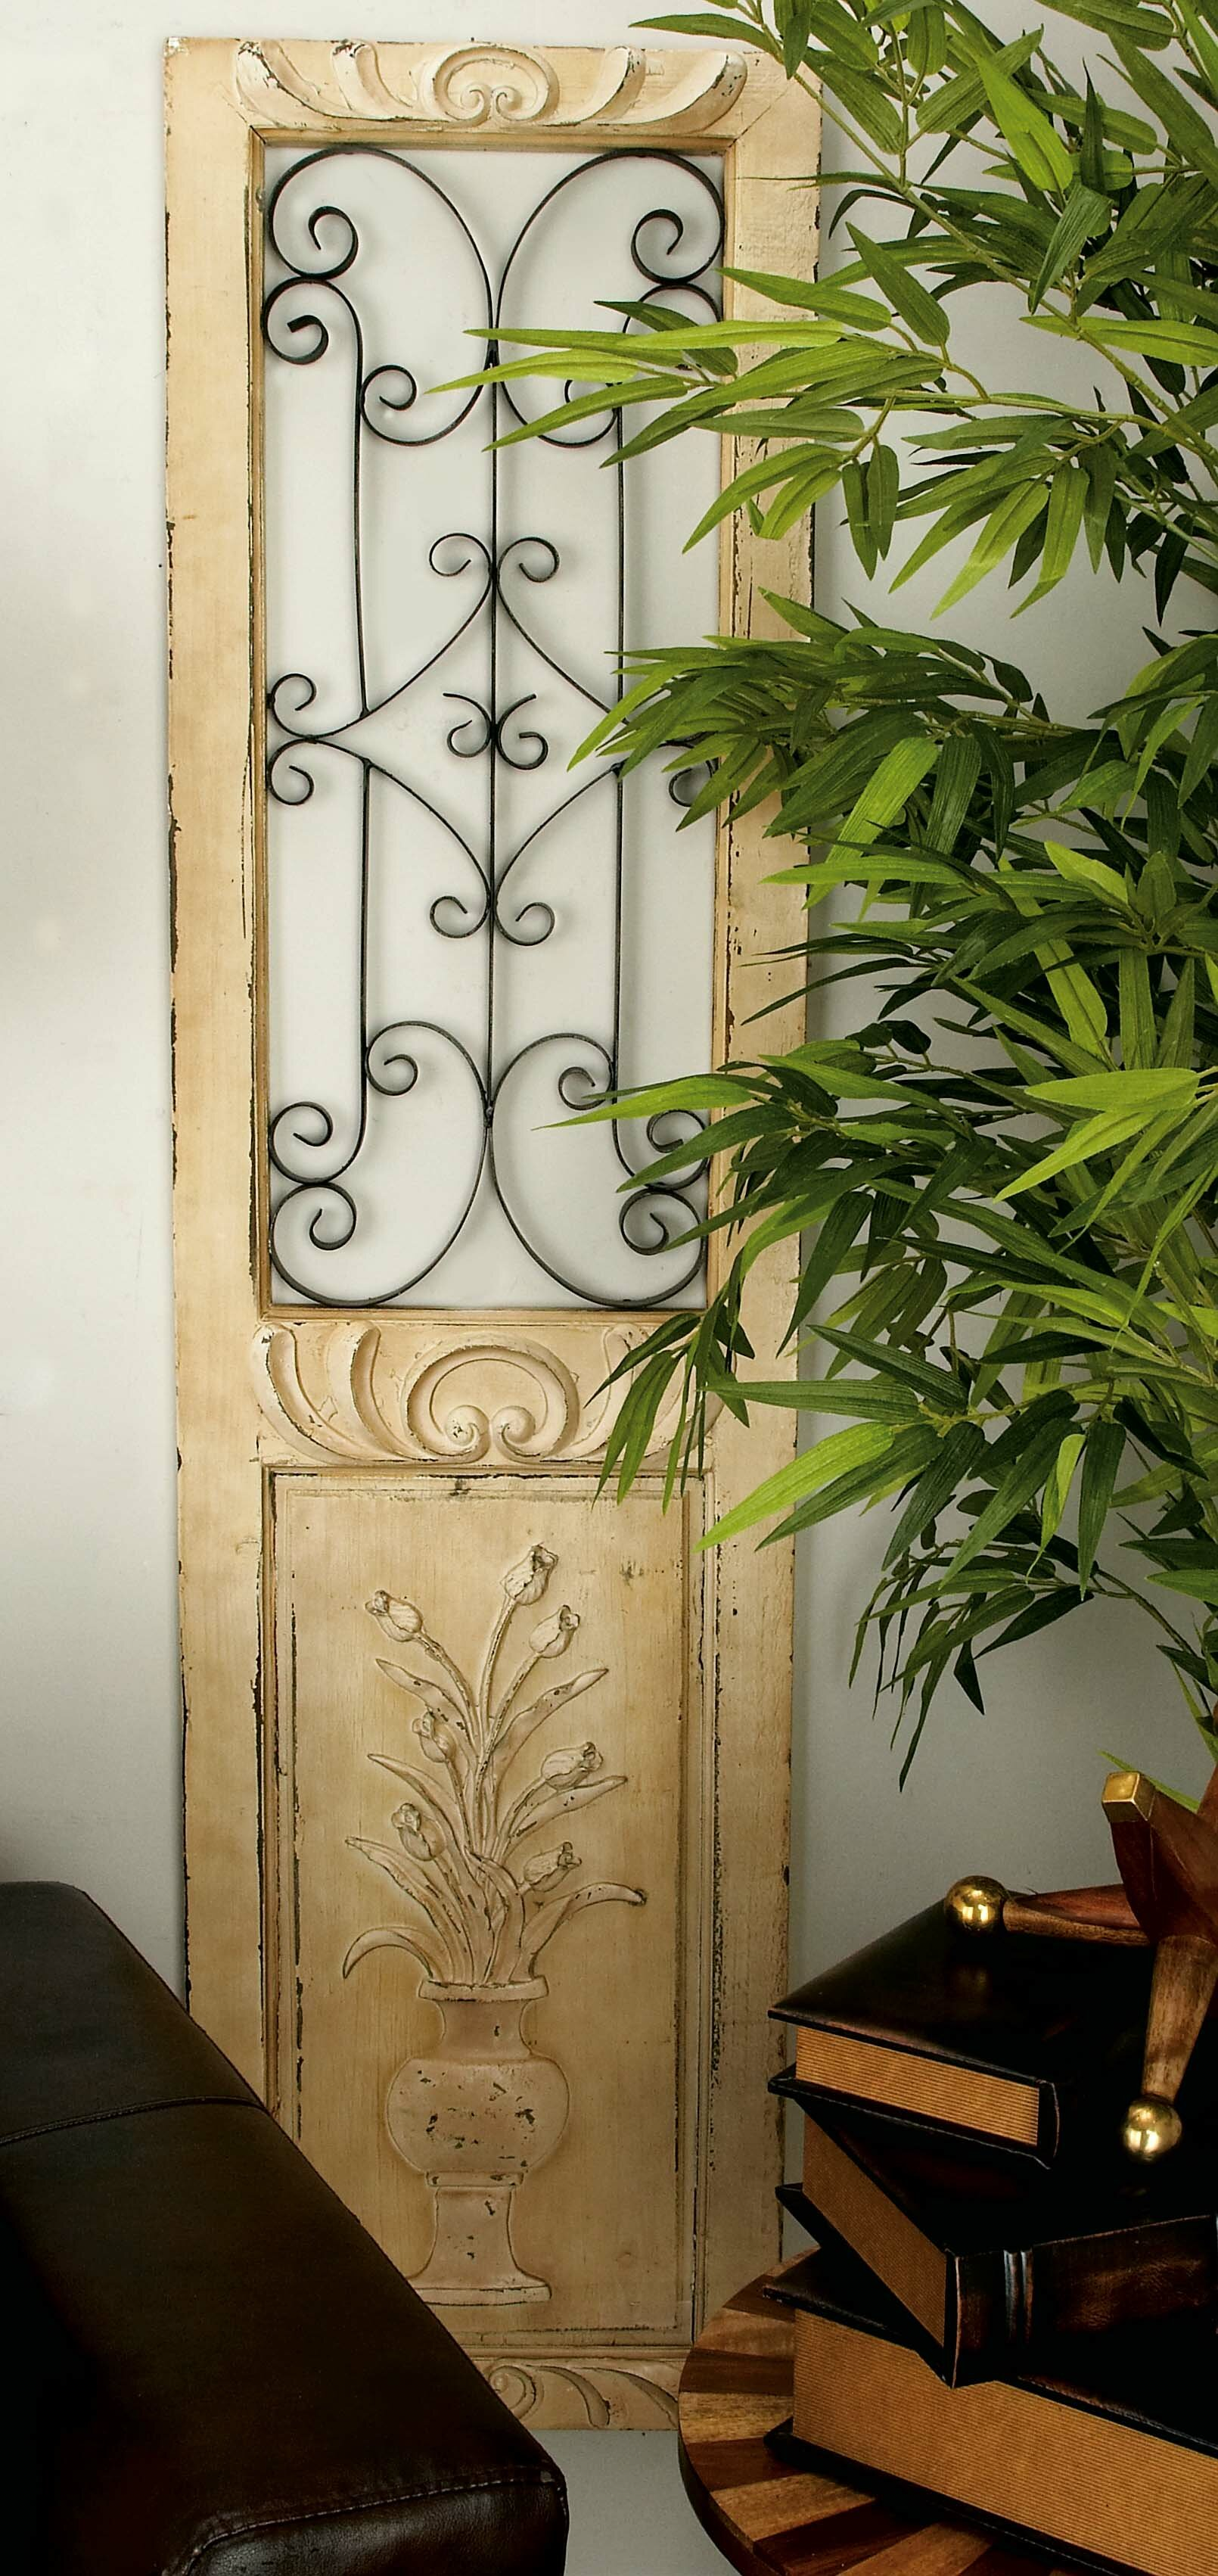 Wood And Metal Door Wall Decor Mesmerizing Cole & Grey Woodmetal Wall Décor & Reviews  Wayfair Design Inspiration